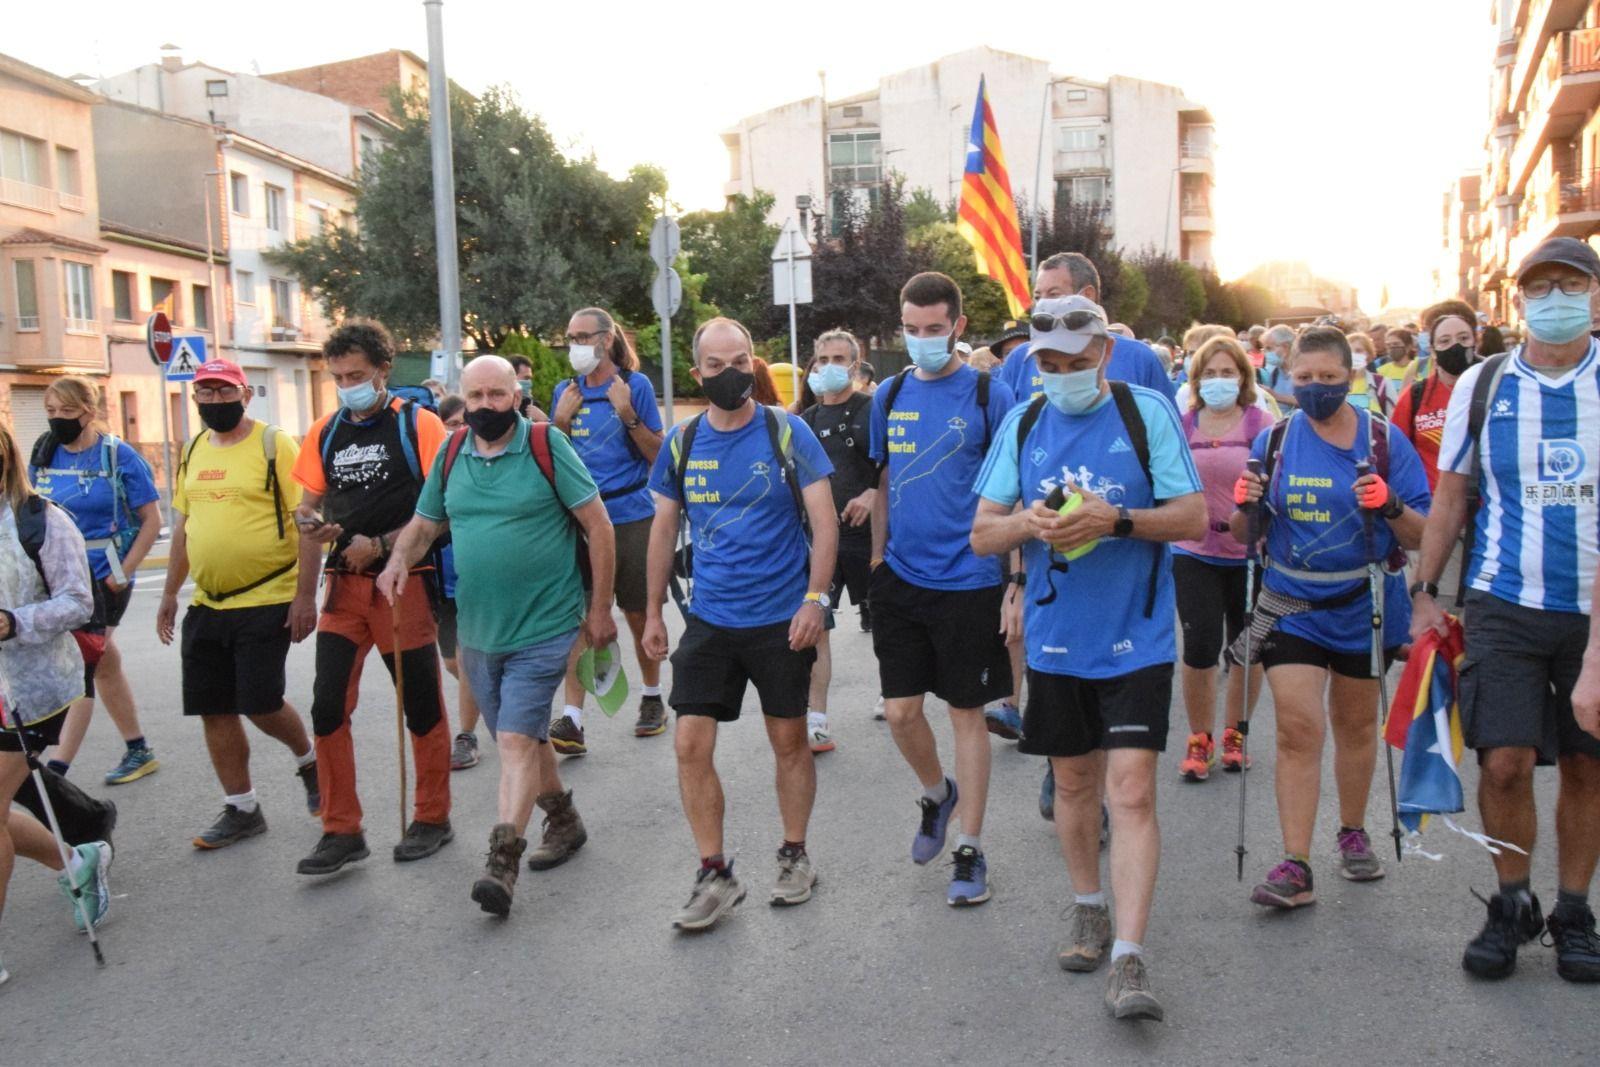 Jordi Turull encapçala la Travessa per la llibertat